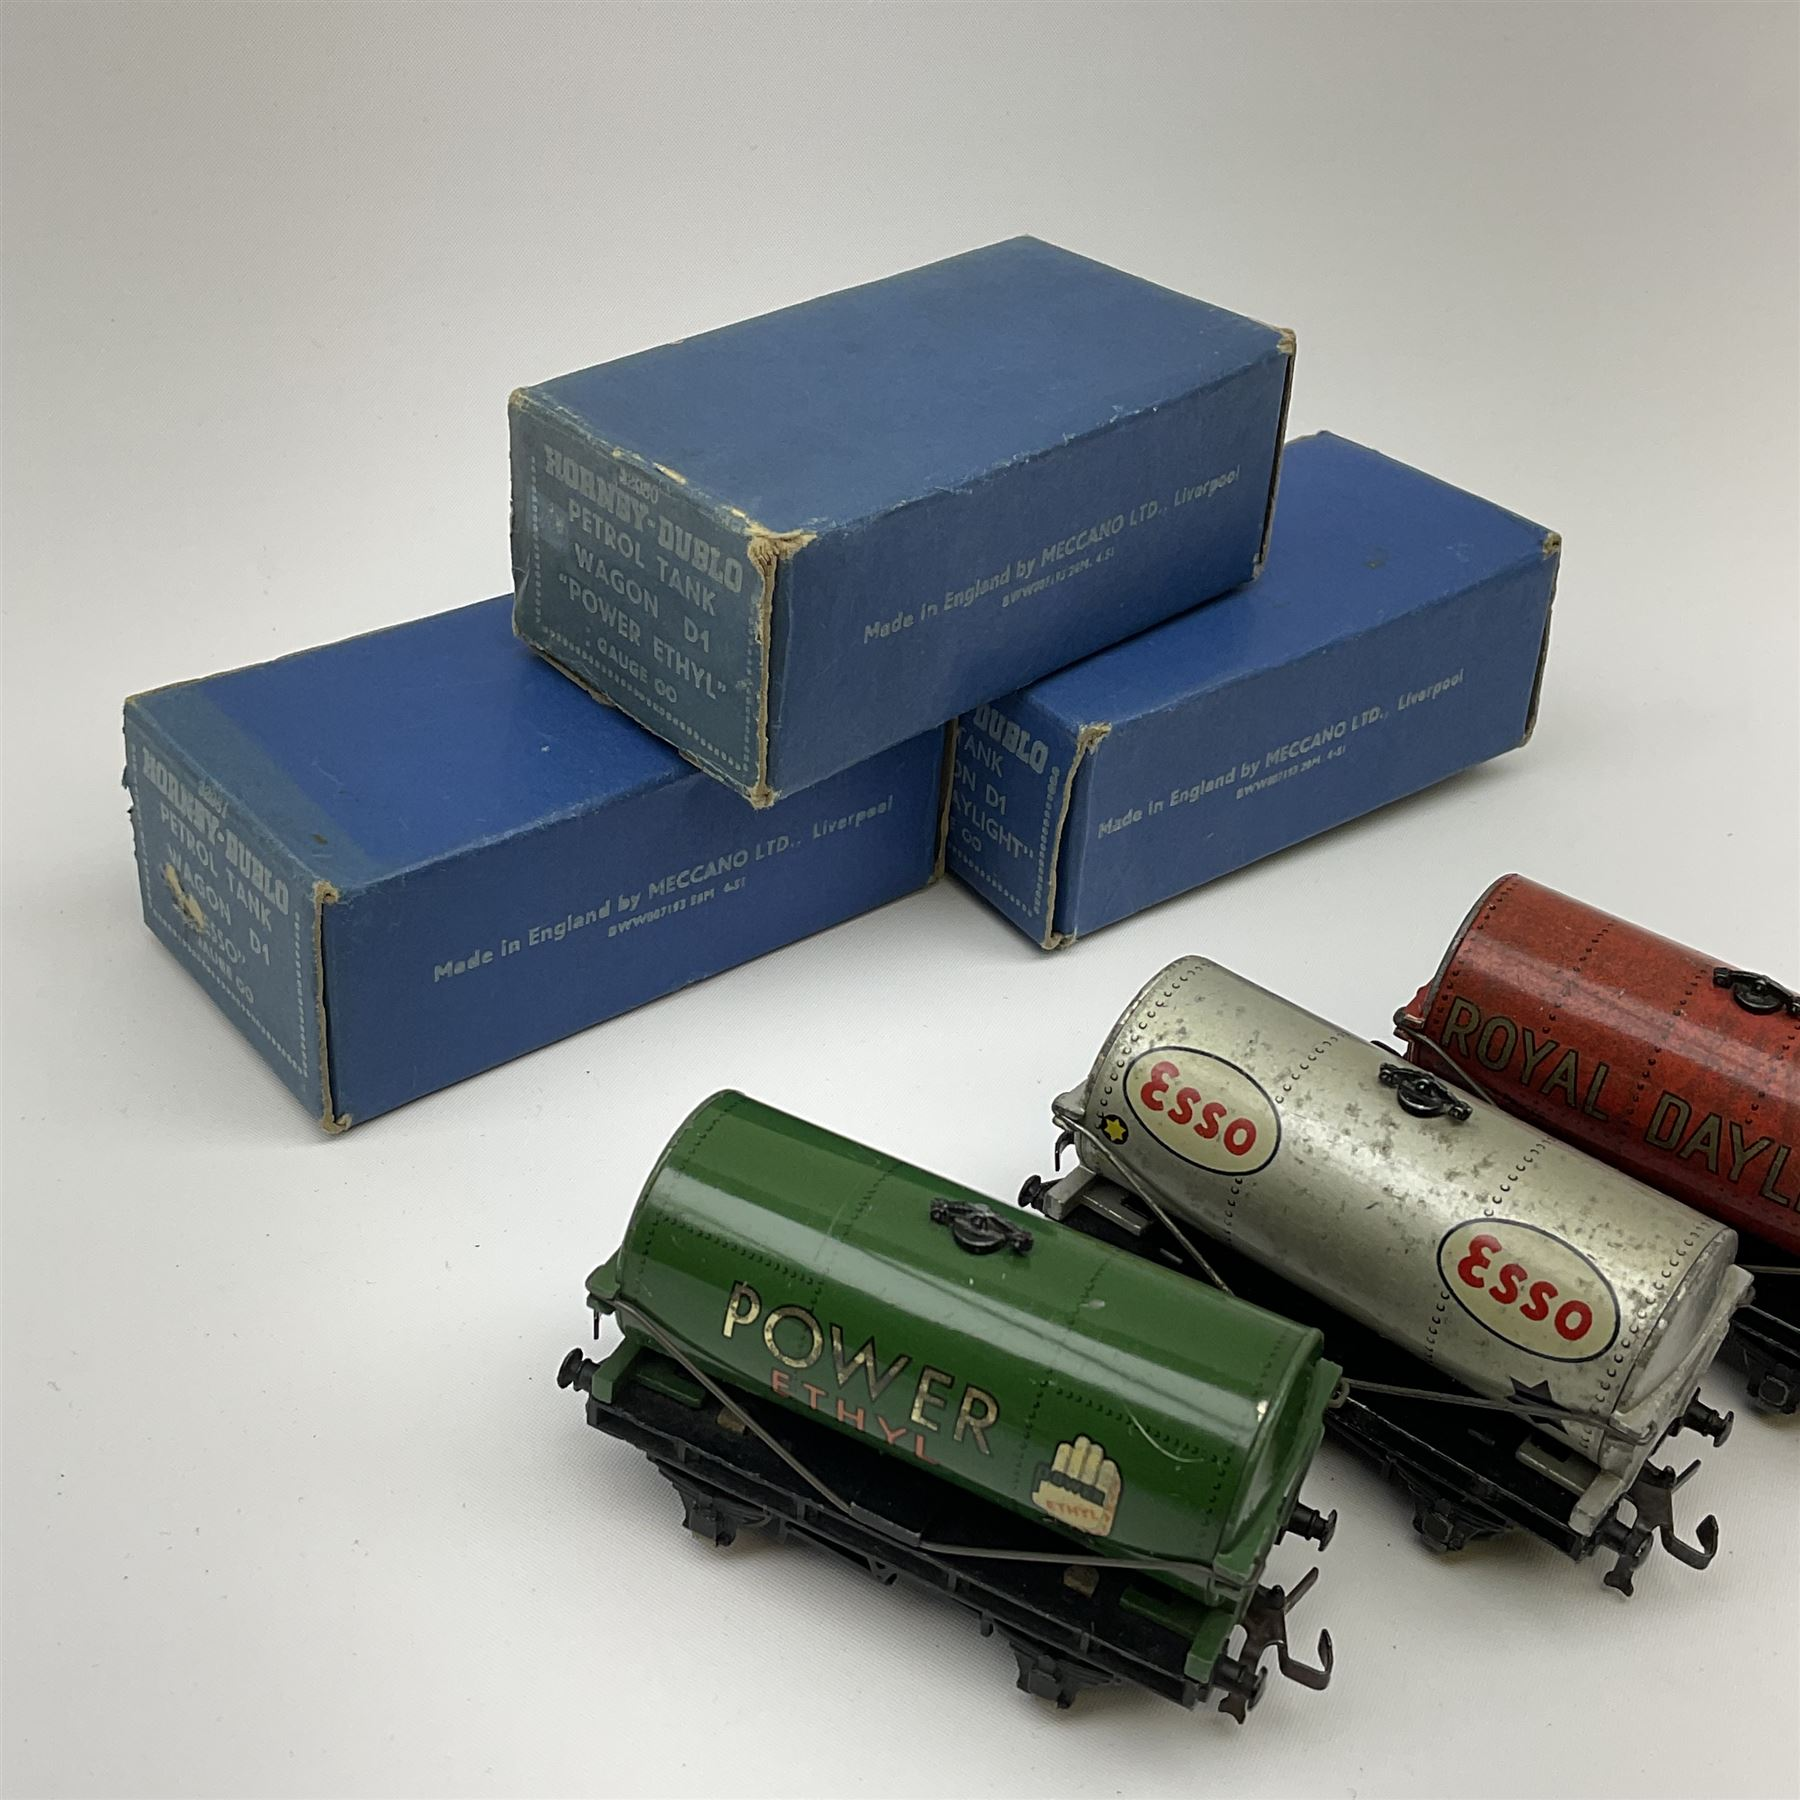 Hornby Dublo - Petrol Tank Wagon D1 'Power Ethyl'; Oil Tank Wagon D1 'Royal Daylight'; and Petrol Ta - Image 2 of 3